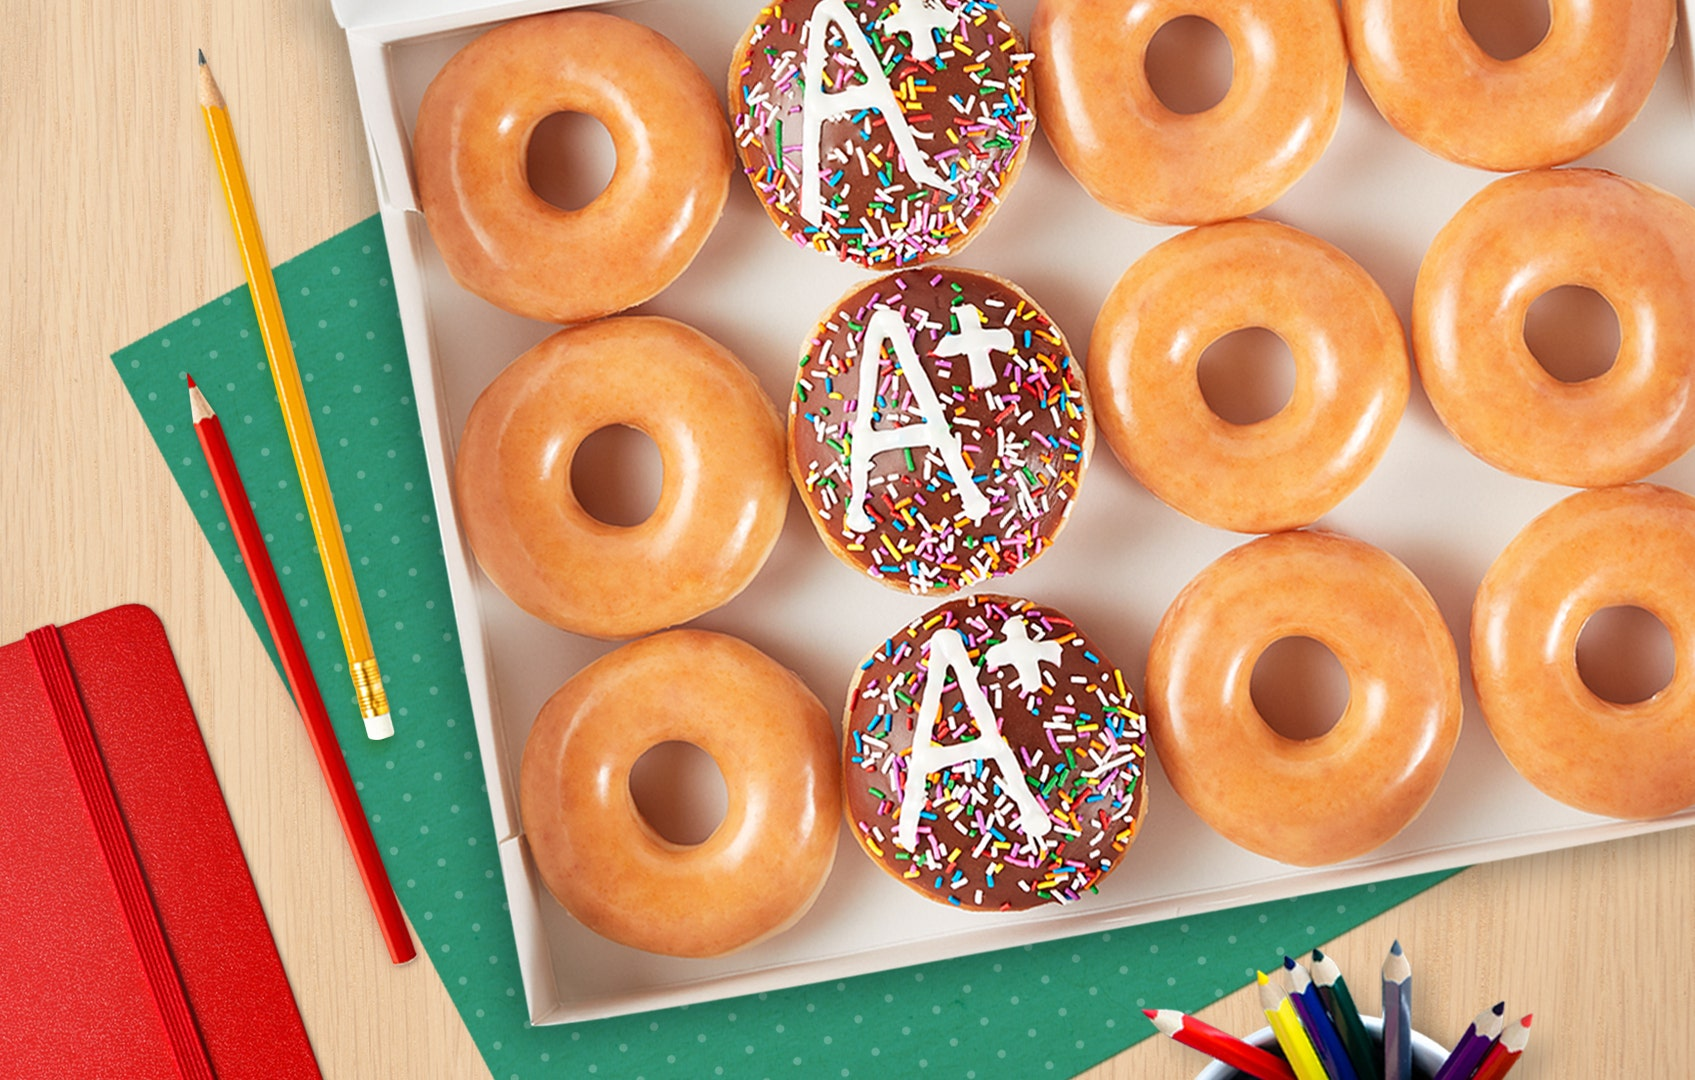 Krispy Kreme offering free coffee, doughnuts for teachers next week - Fox Business